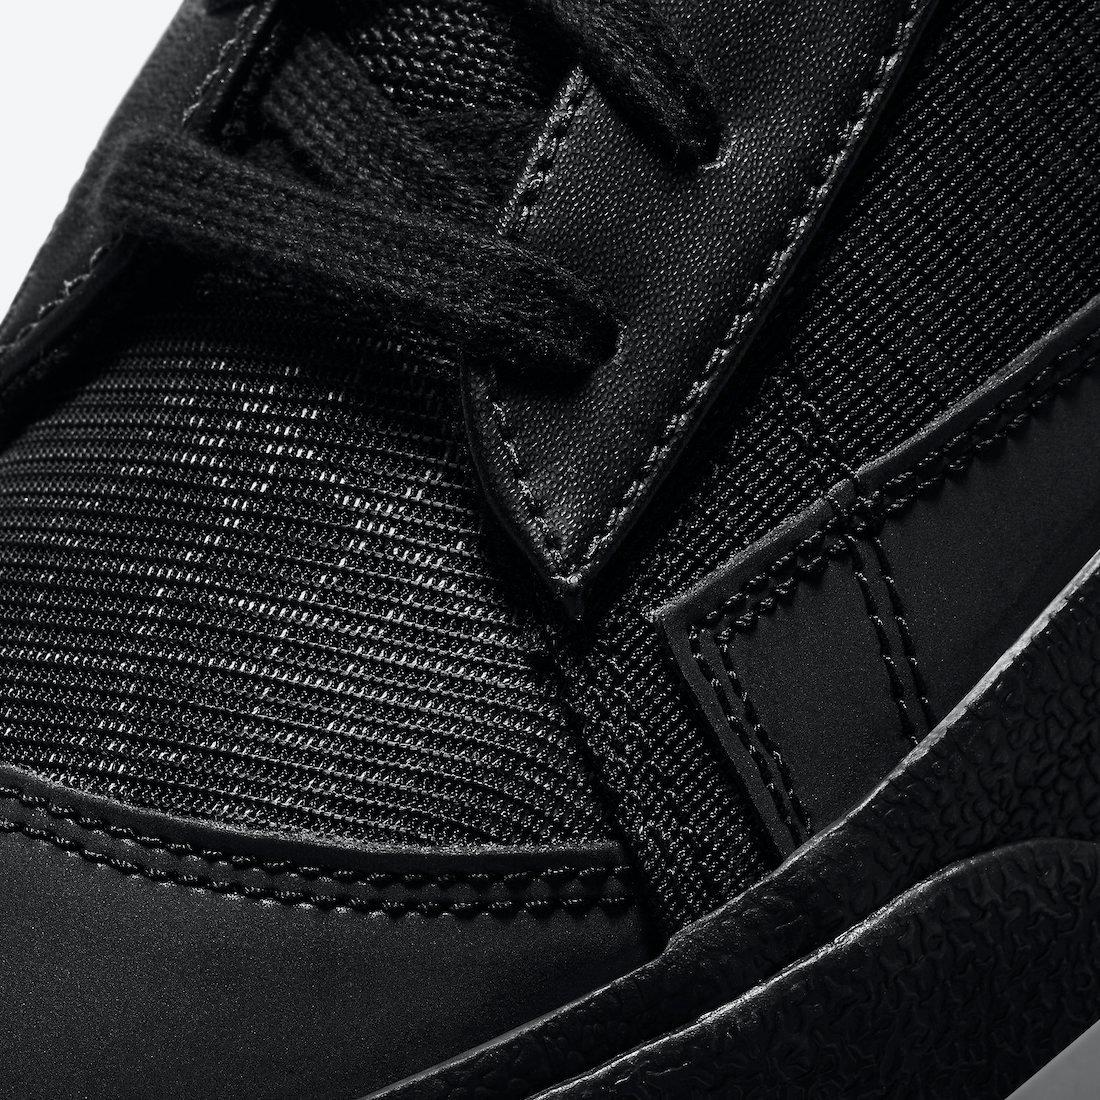 Nike Blazer Mid Spider Web DC1929-001 Release Date Info